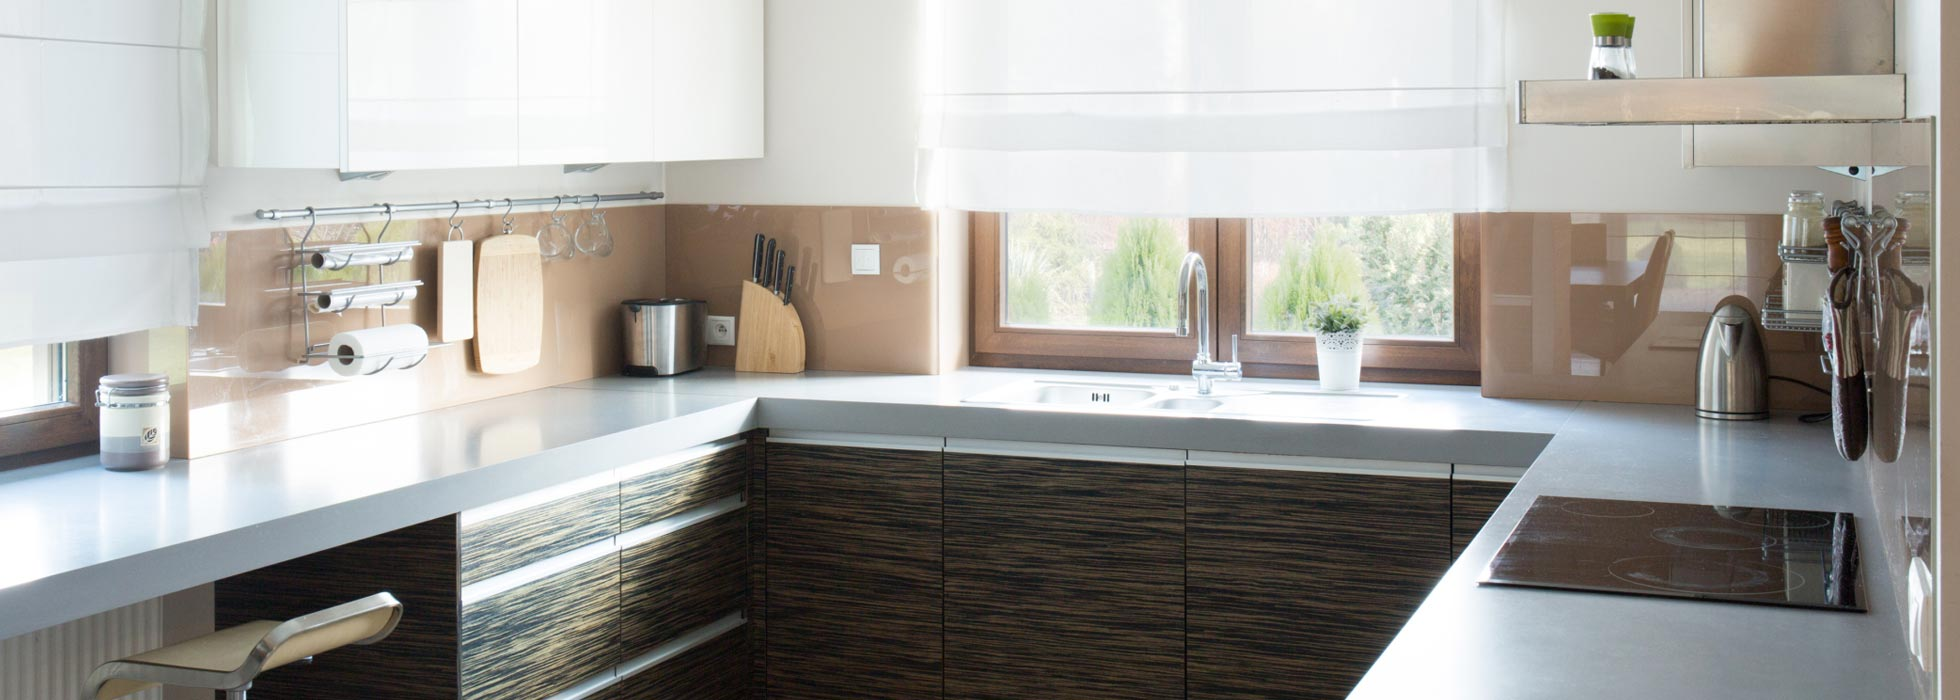 carli construction kitchen design renovation